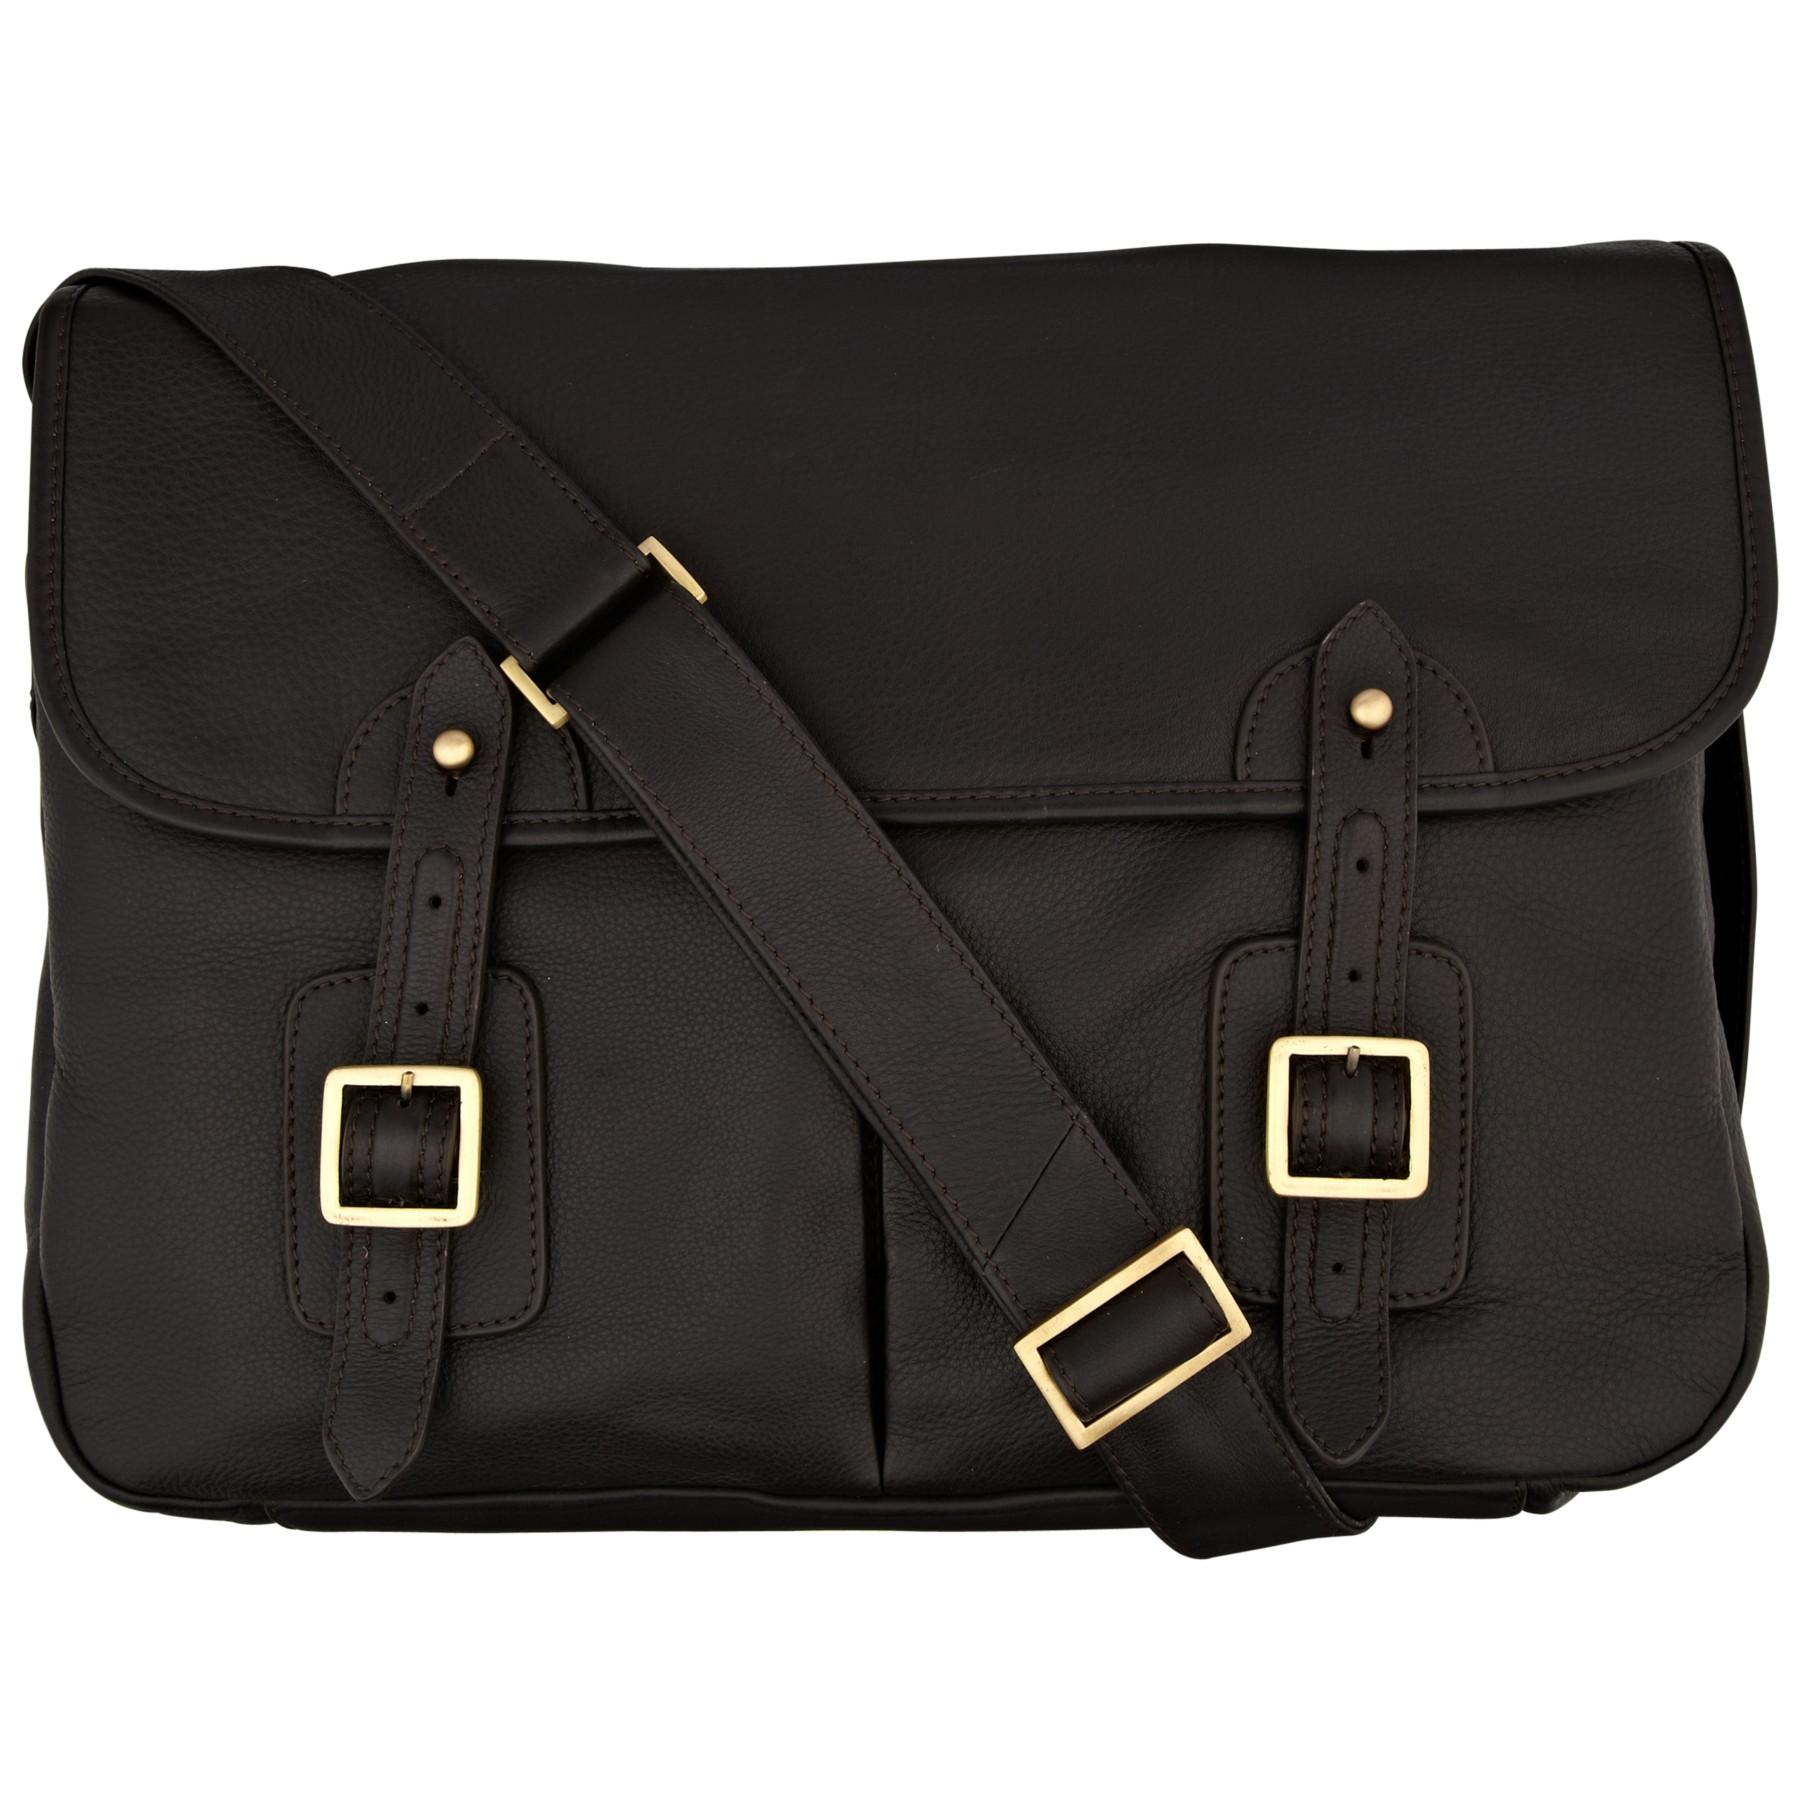 John Lewis Oxford Leather Messenger Bag In Brown For Men